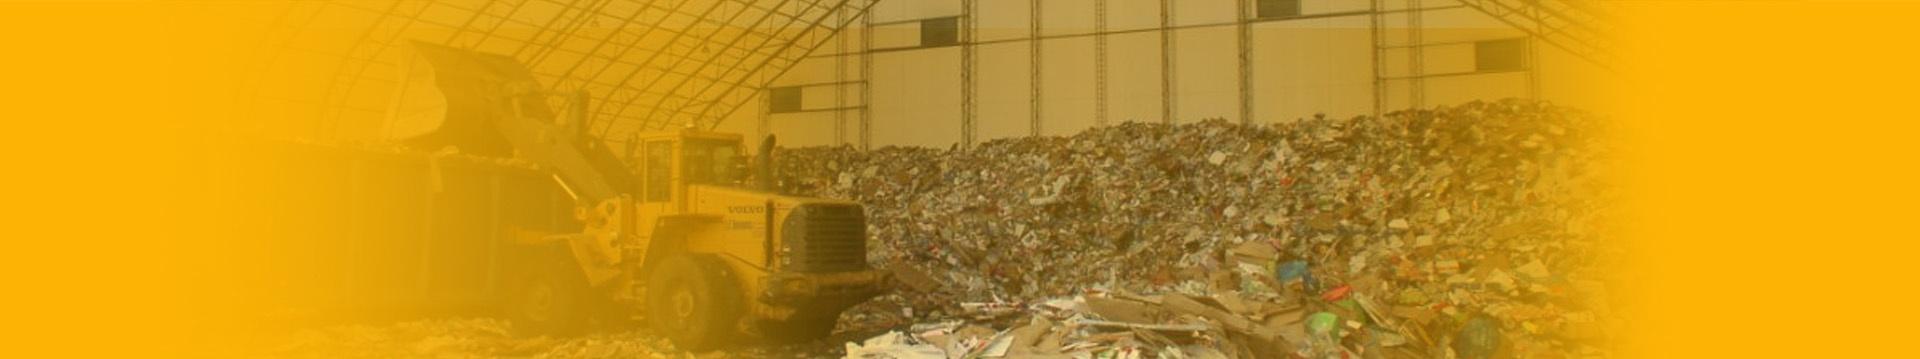 LP_Brochure Download_Recycling Banner